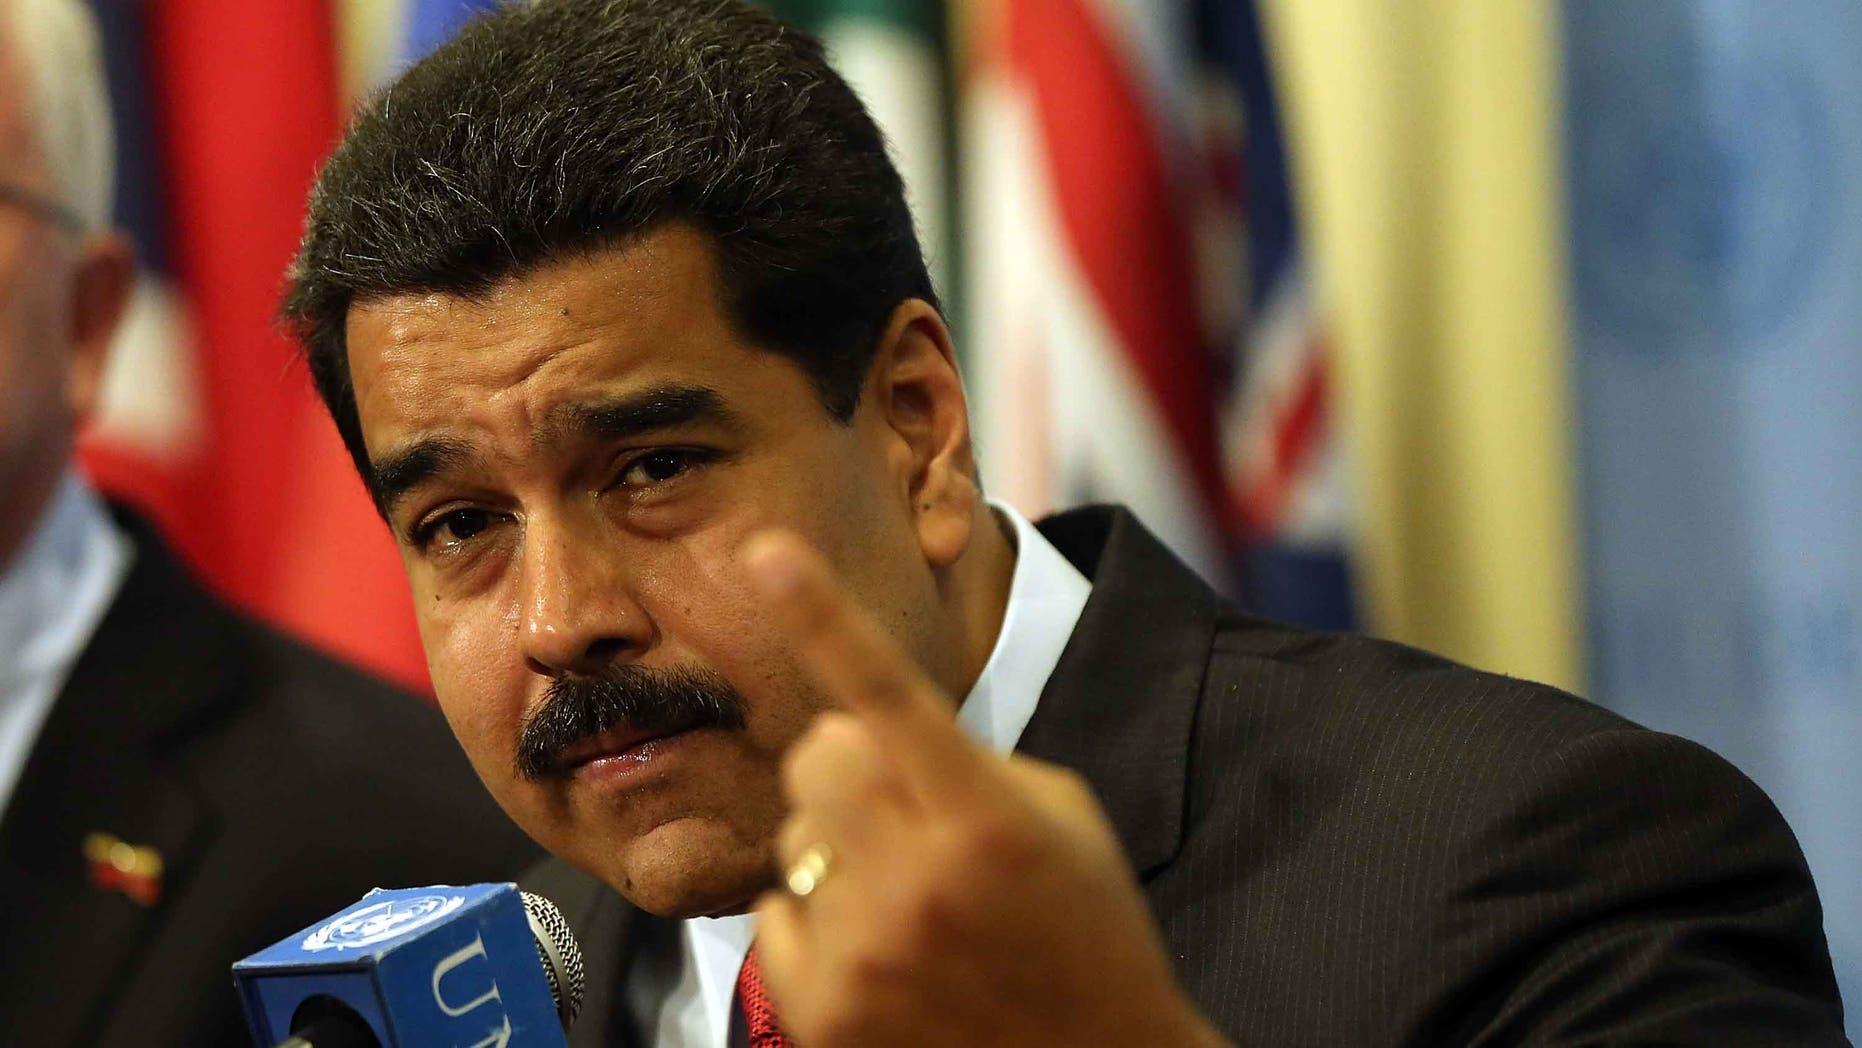 Venezuelan President Nicolas Maduro at the UN headquarters in New York on July 28, 2015.